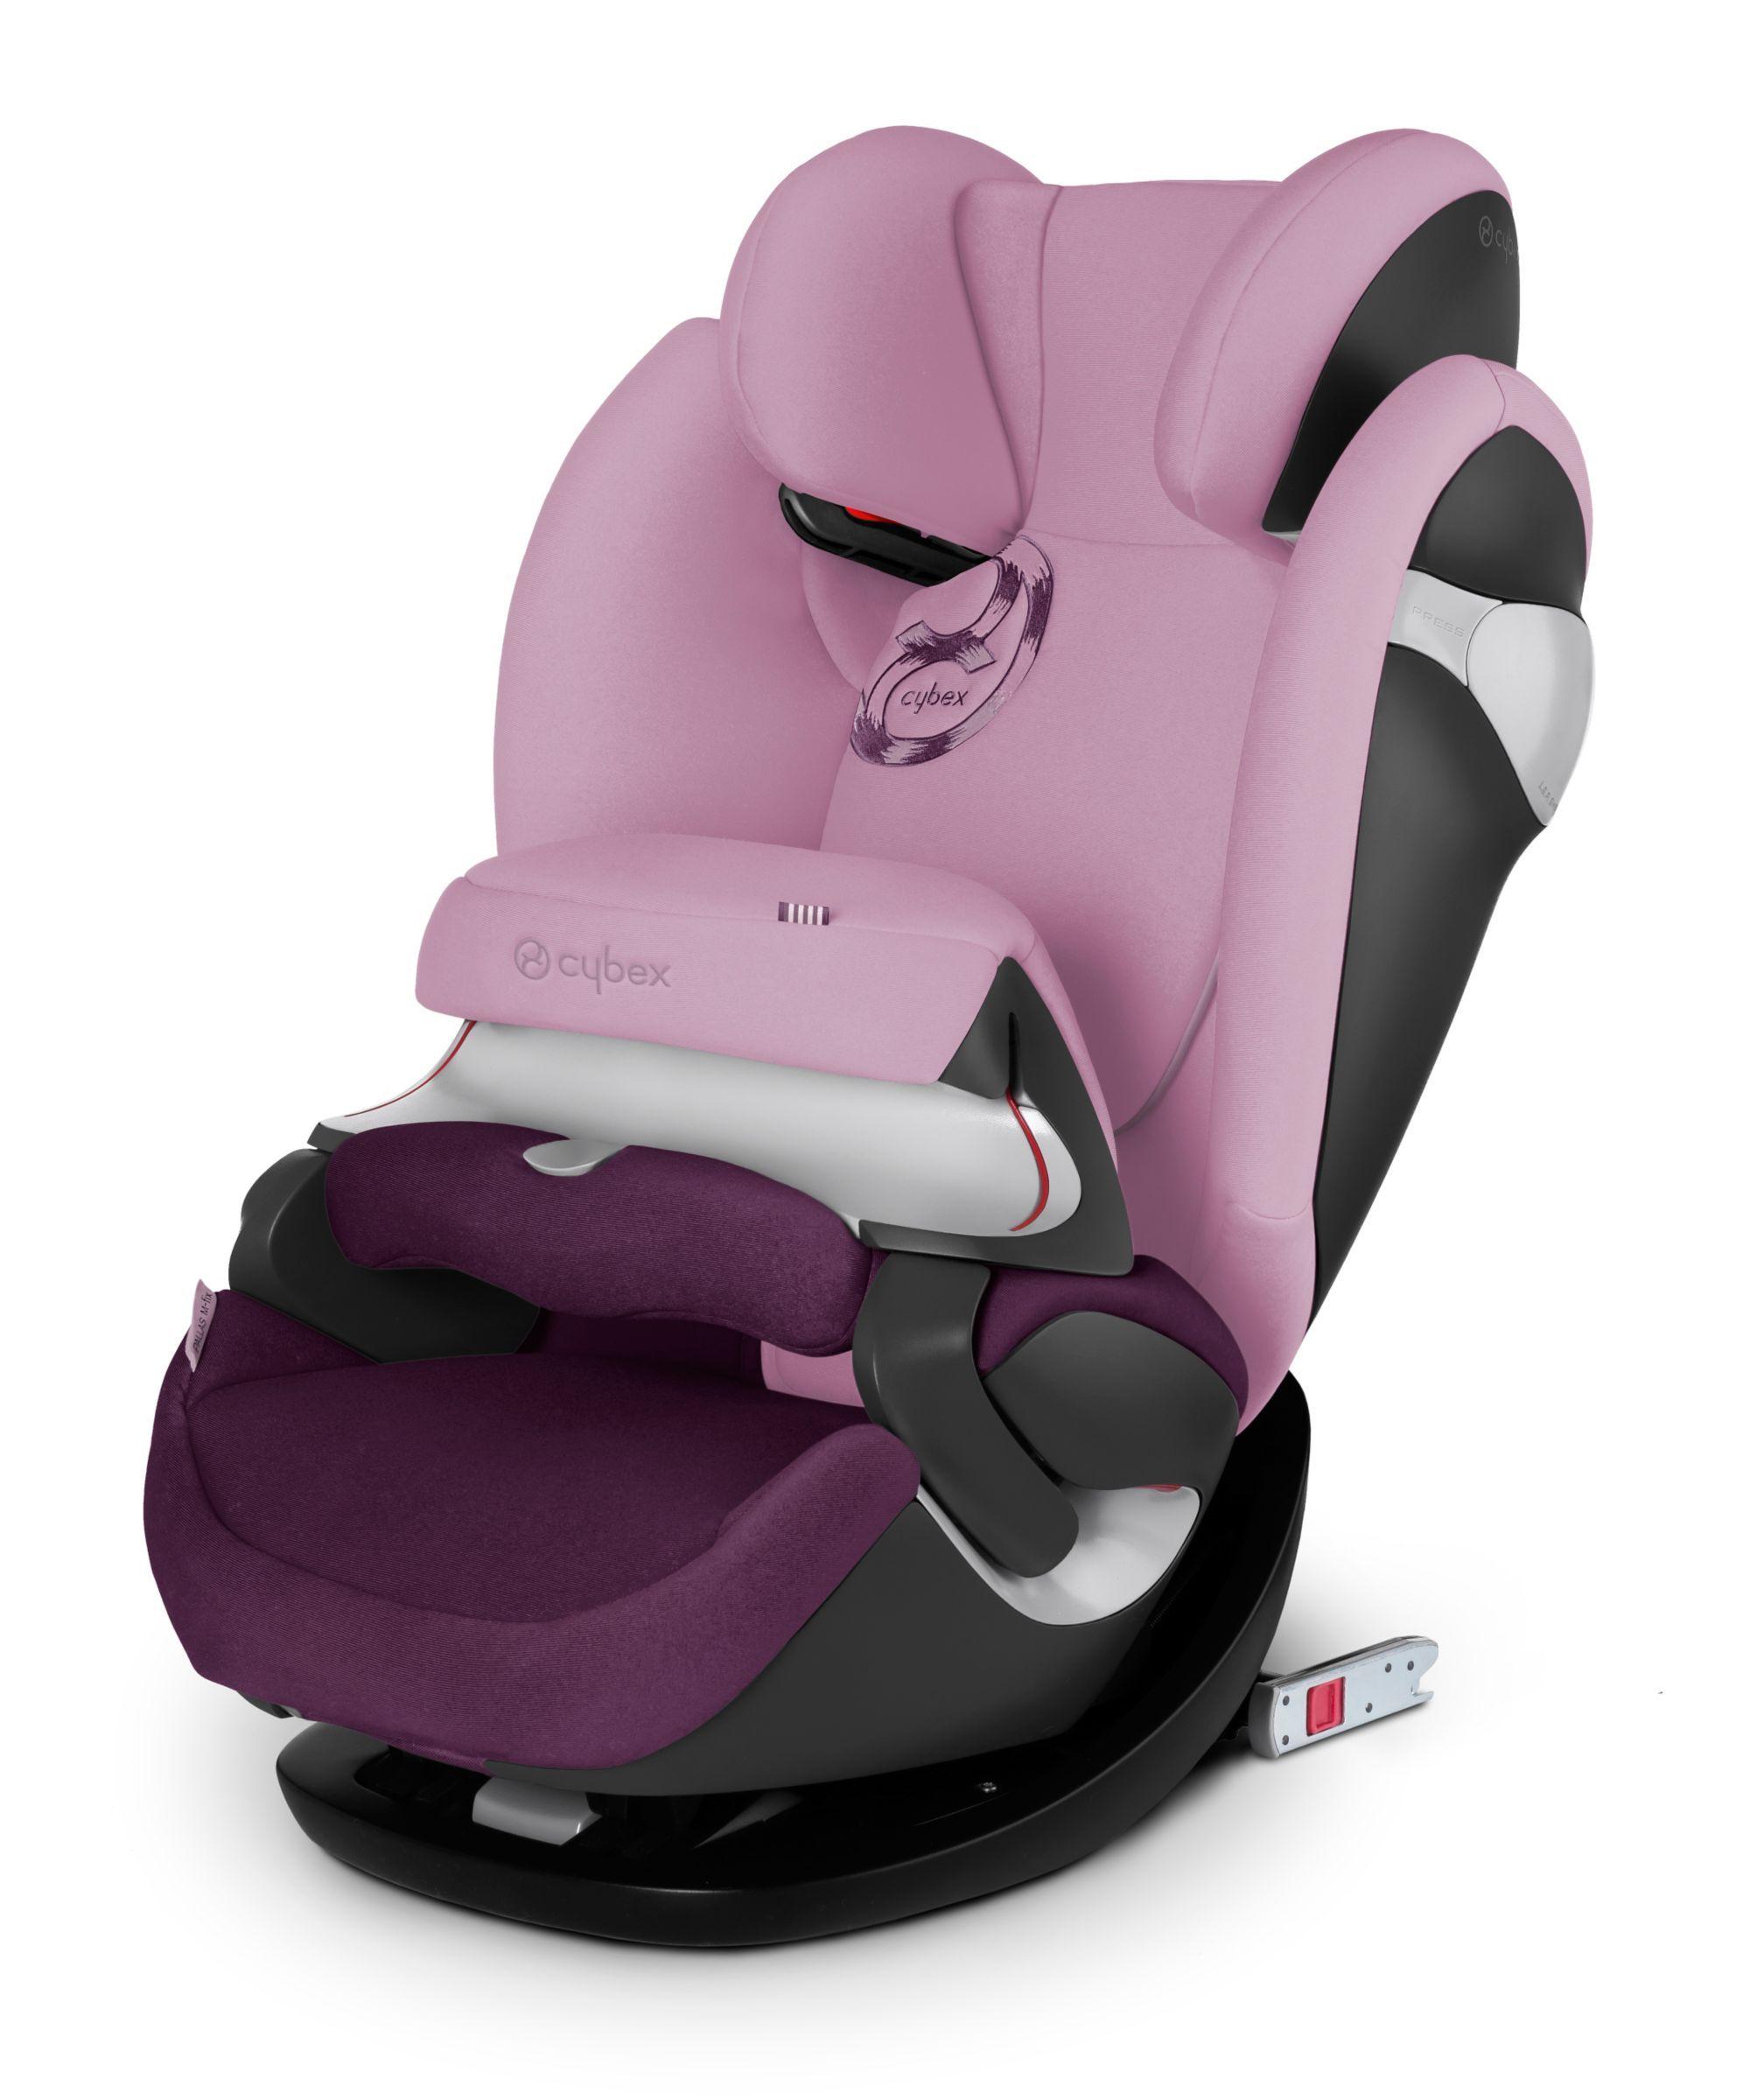 Cybex Pallas M-Fix Highback Booster ISOFIX Car Seat - Princess Pink ...